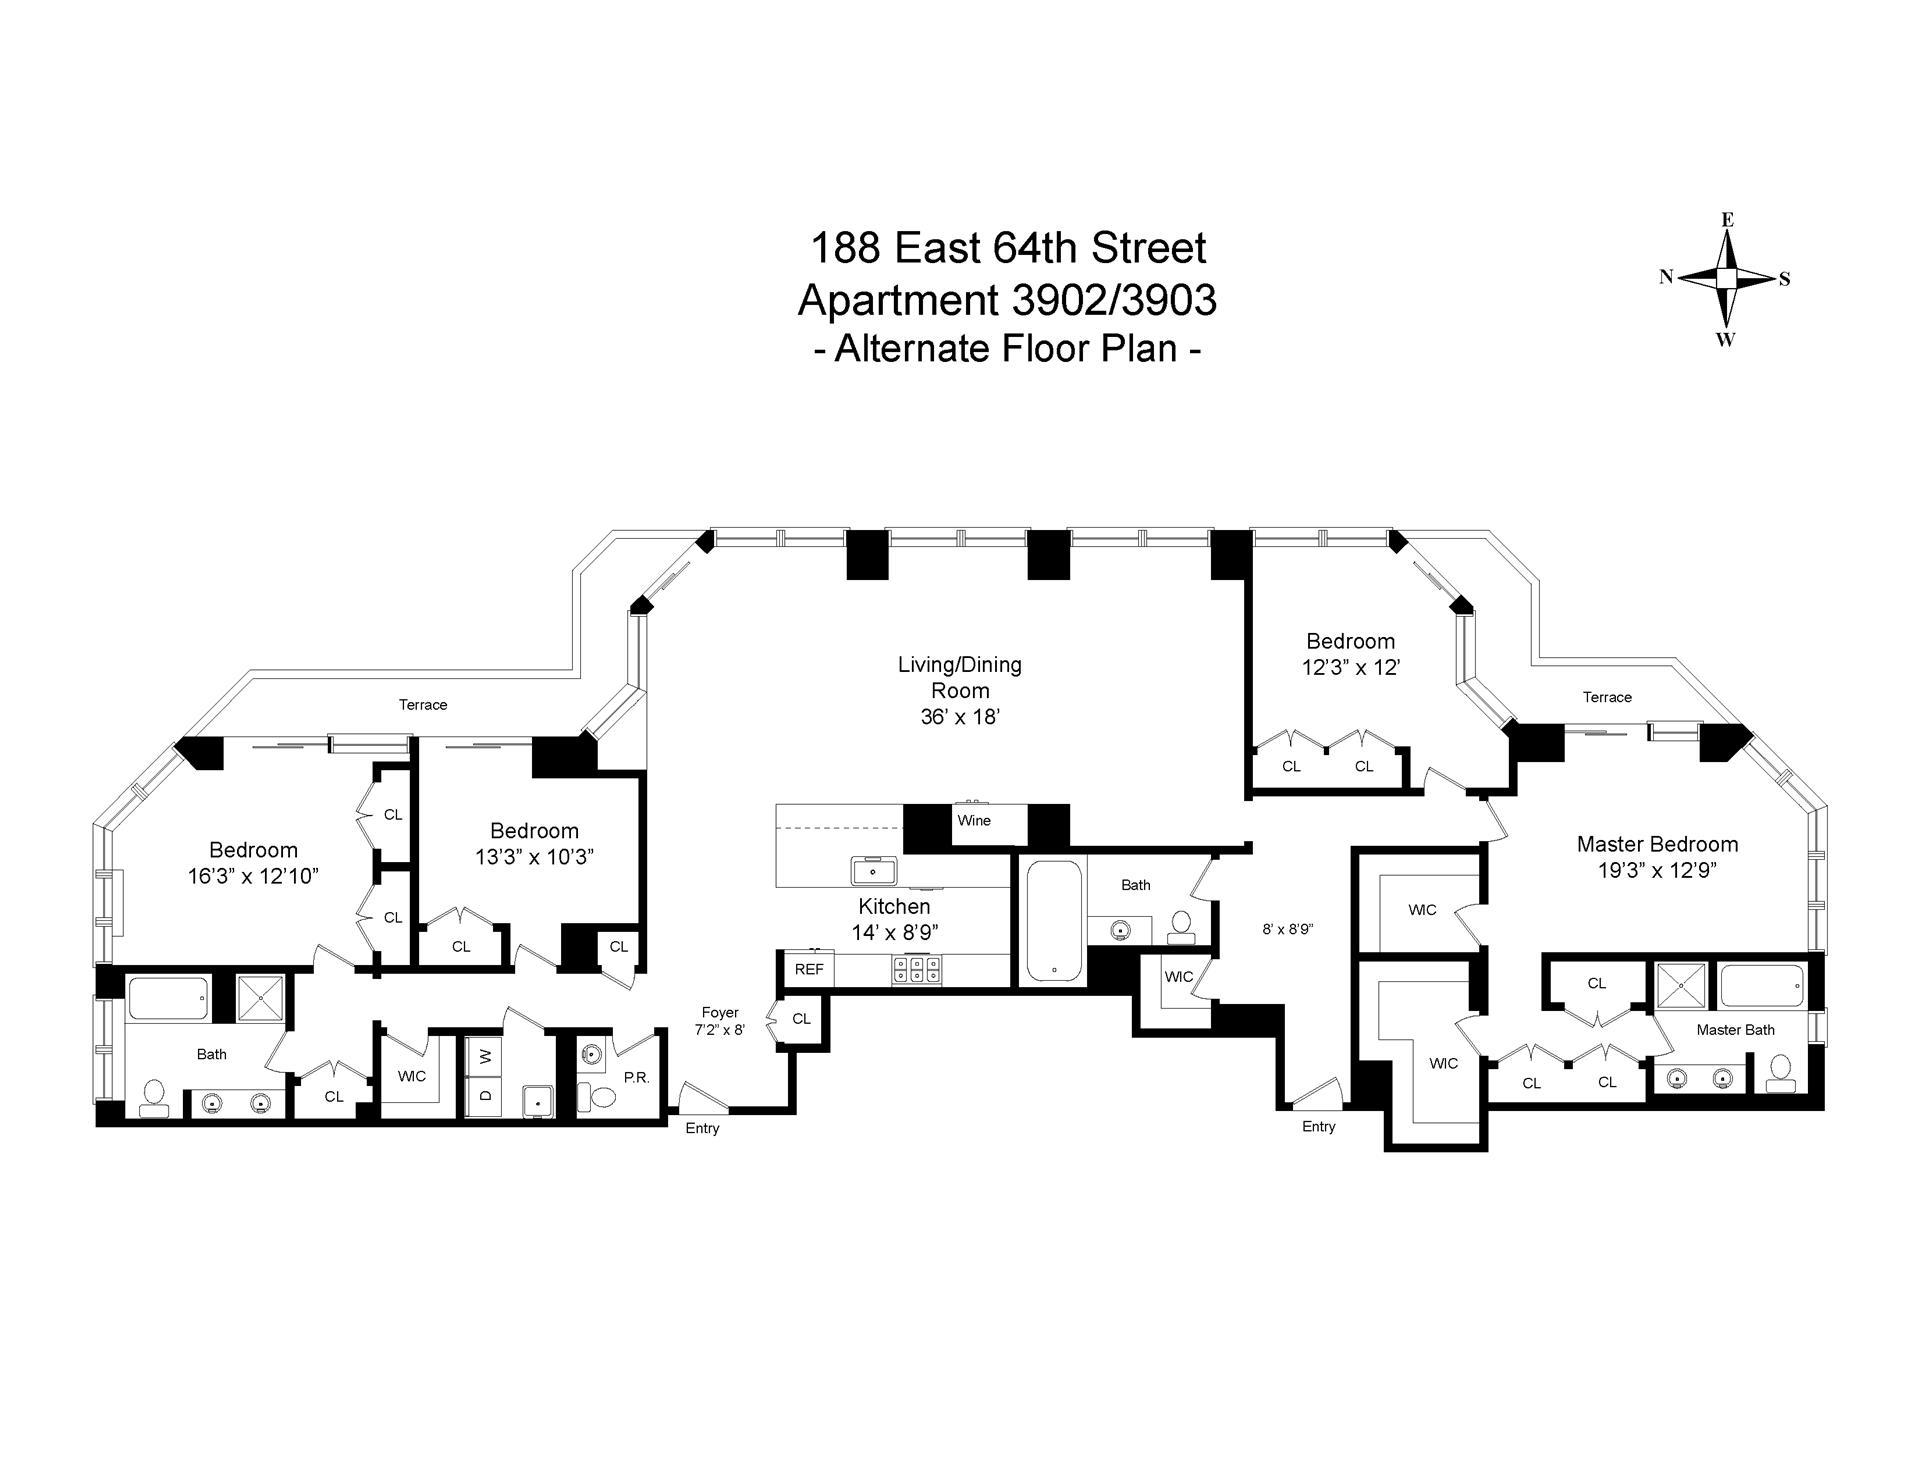 Floor plan of The Royale, 188 East 64th Street, 3902/03 - Upper East Side, New York